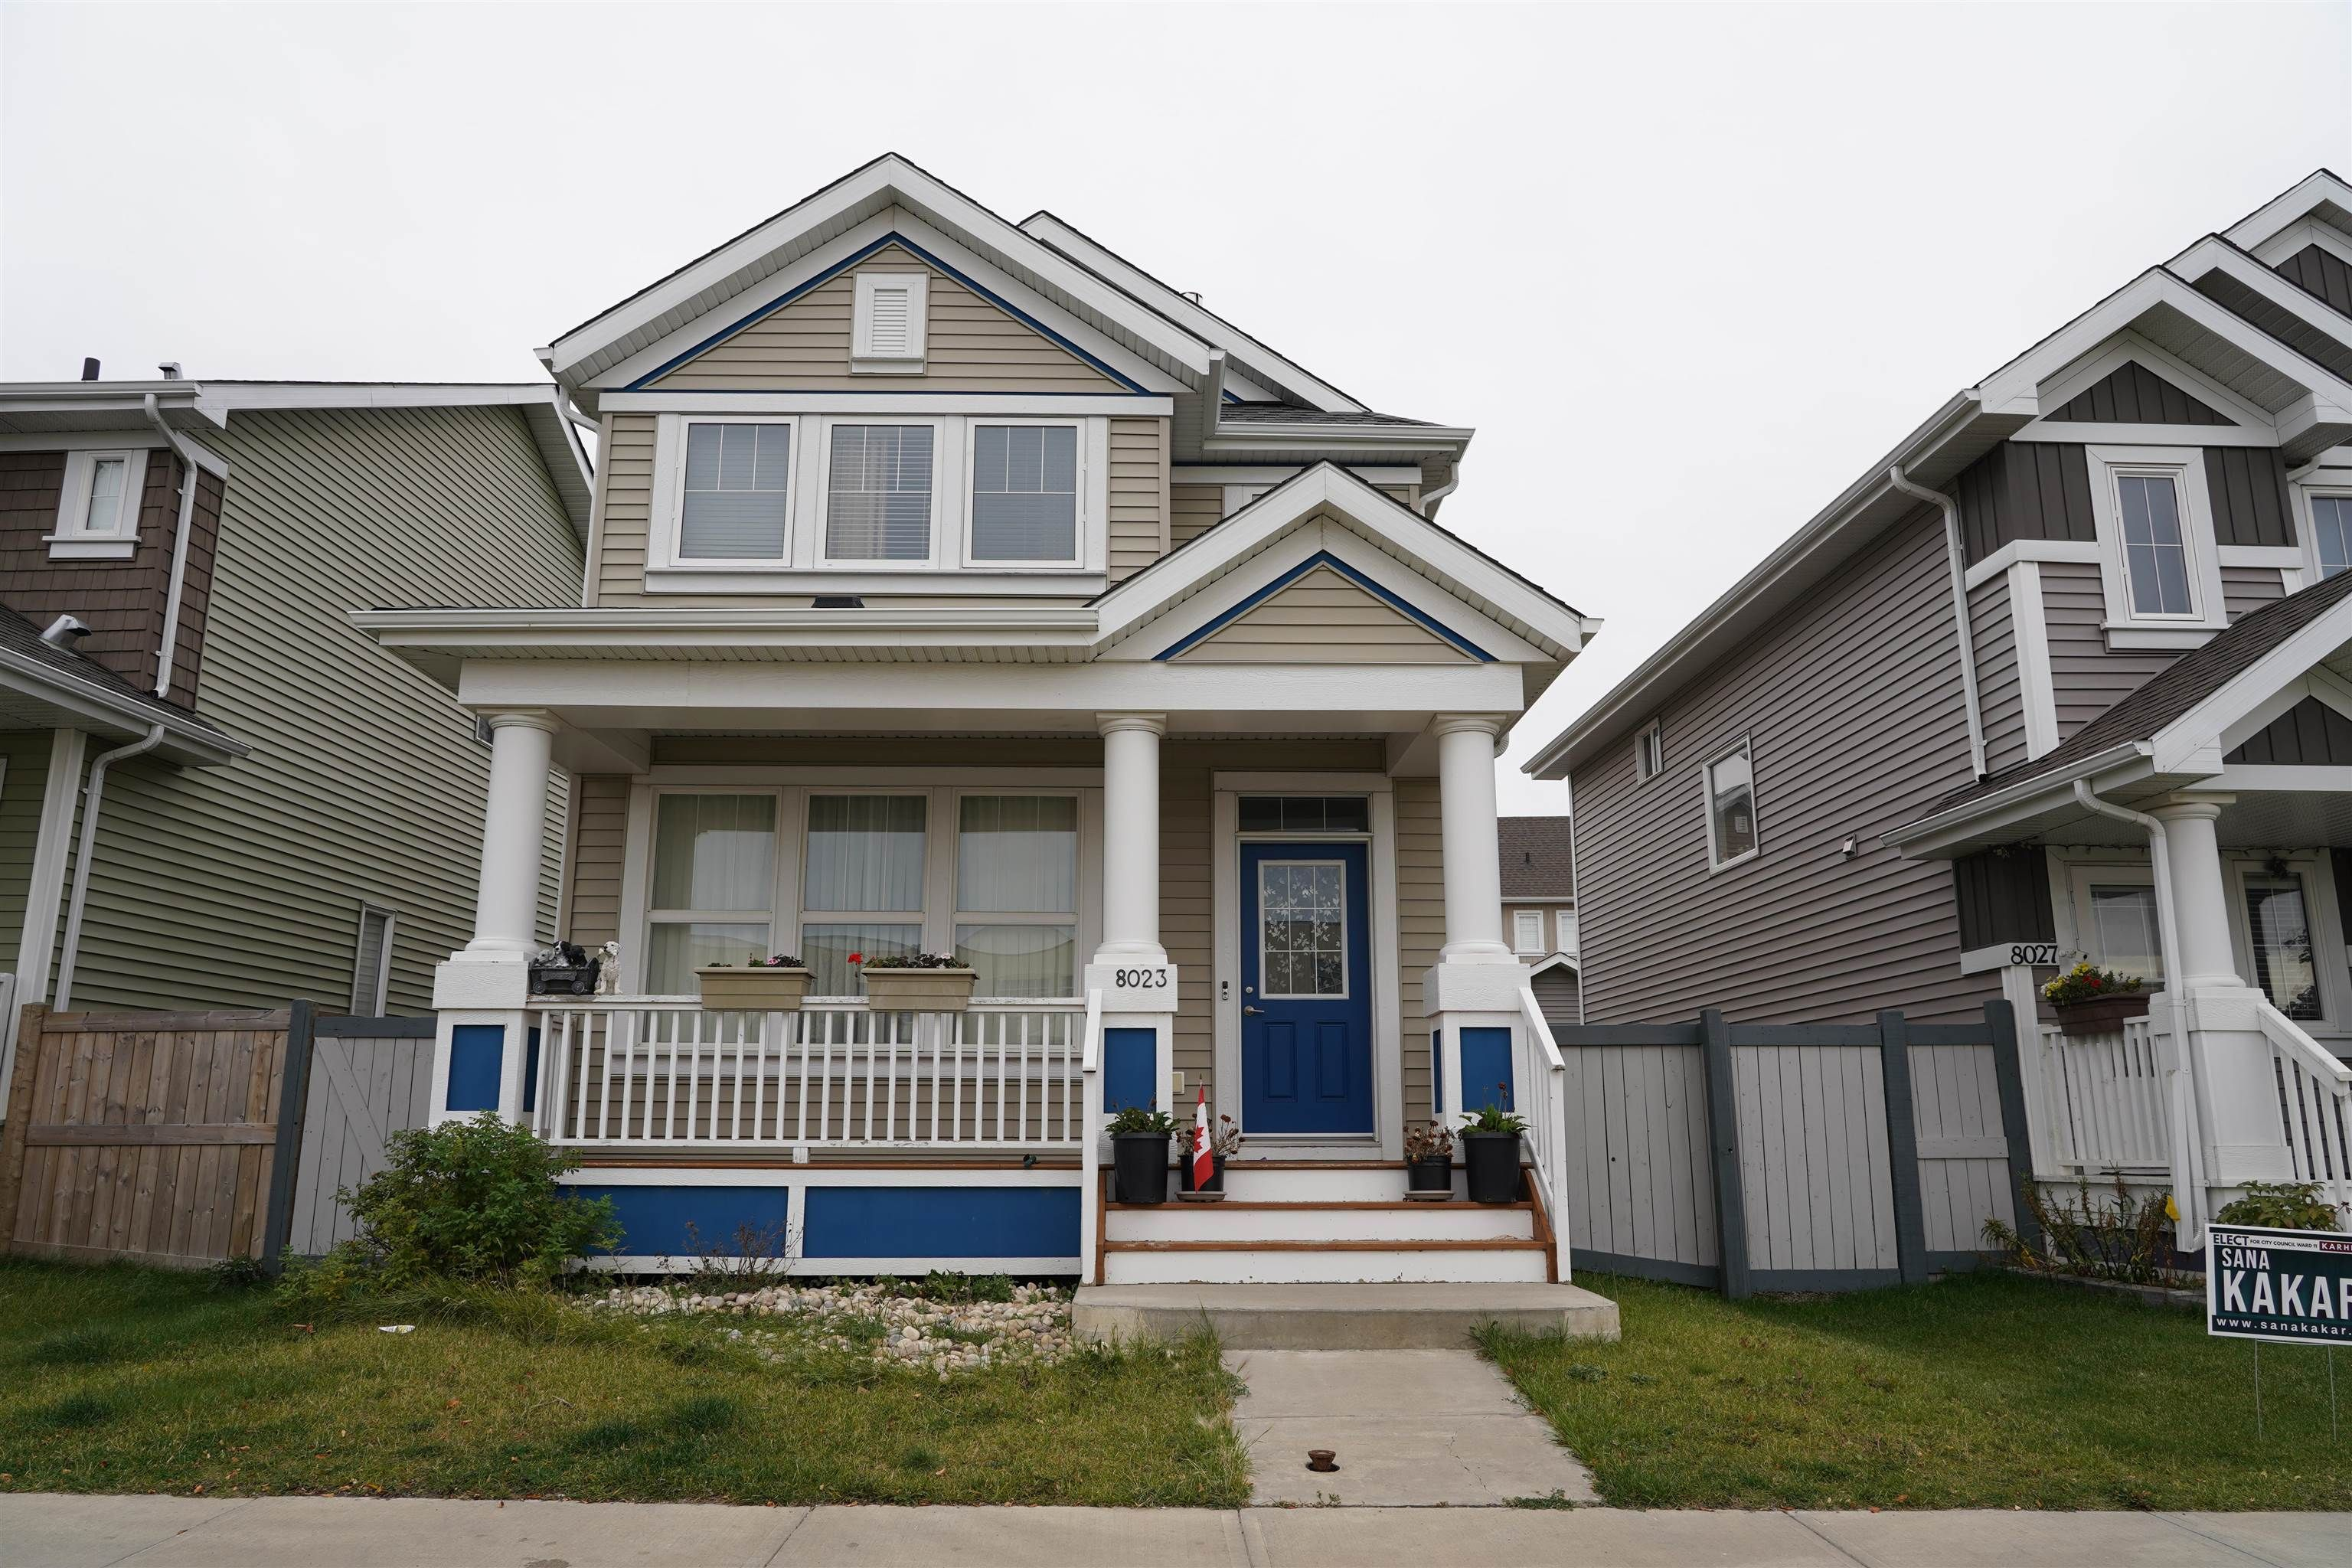 Main Photo: 8023 22 Avenue in Edmonton: Zone 53 House for sale : MLS®# E4265173